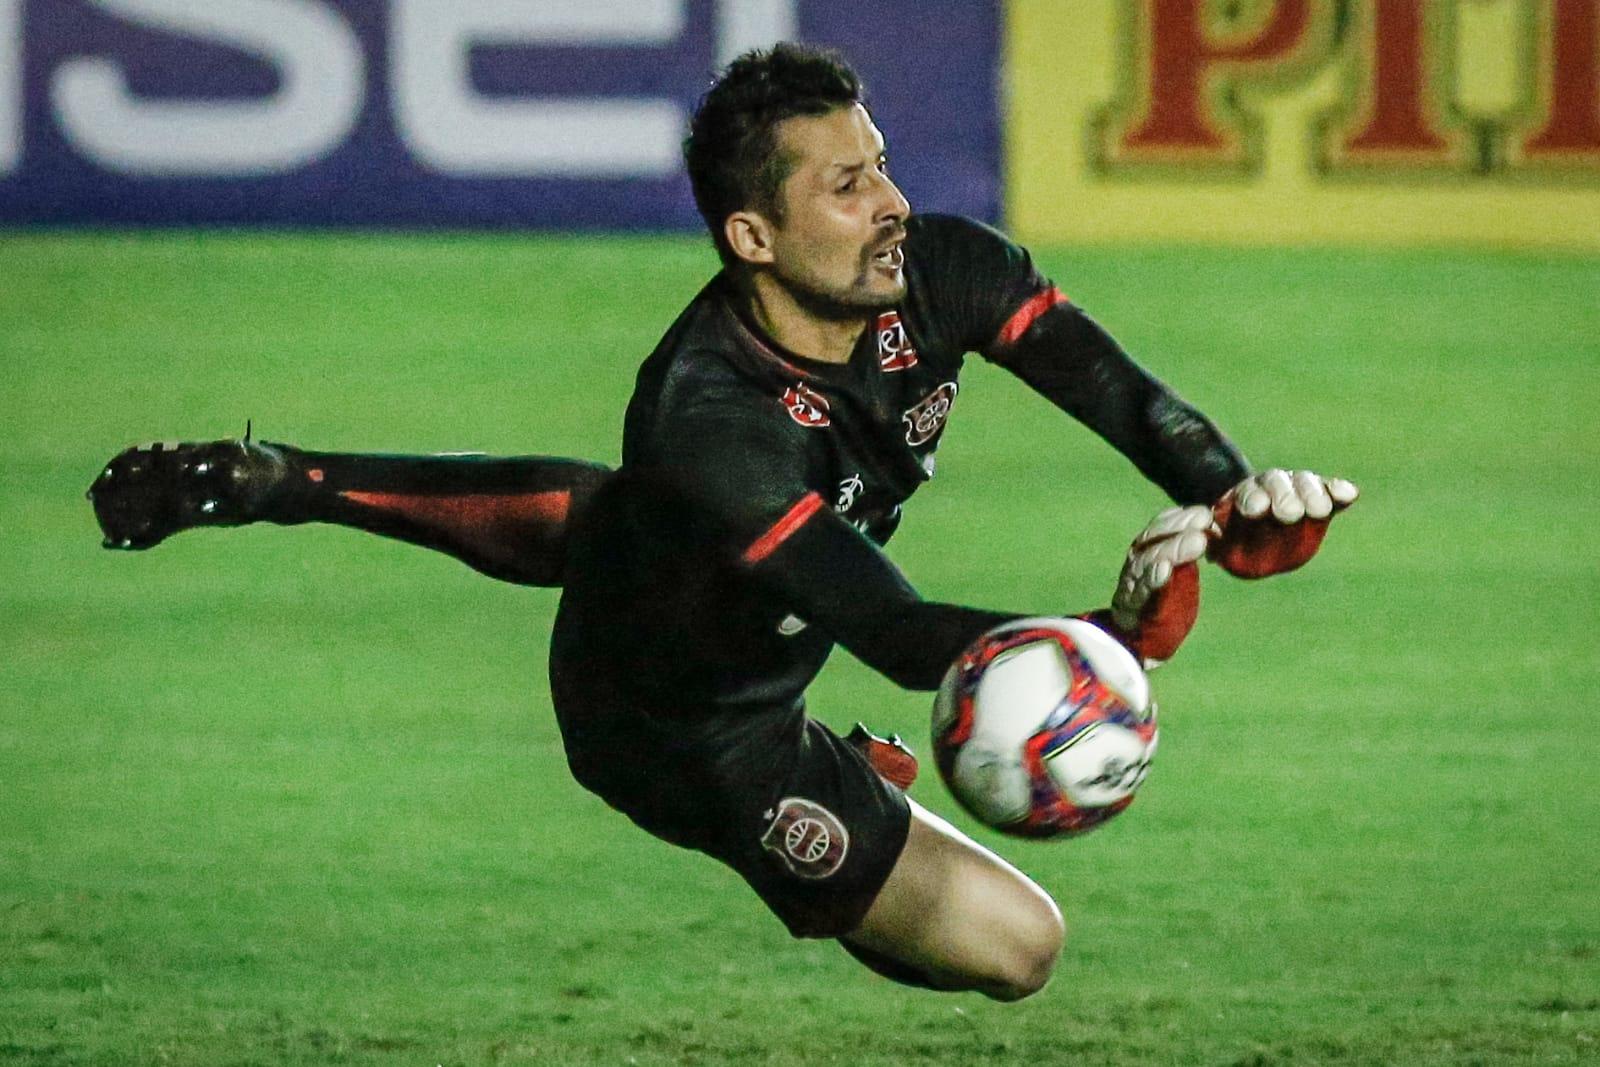 Com dois gols de Jean Carlos, Timbu se manteve como líder invicto - Paulo Paiva